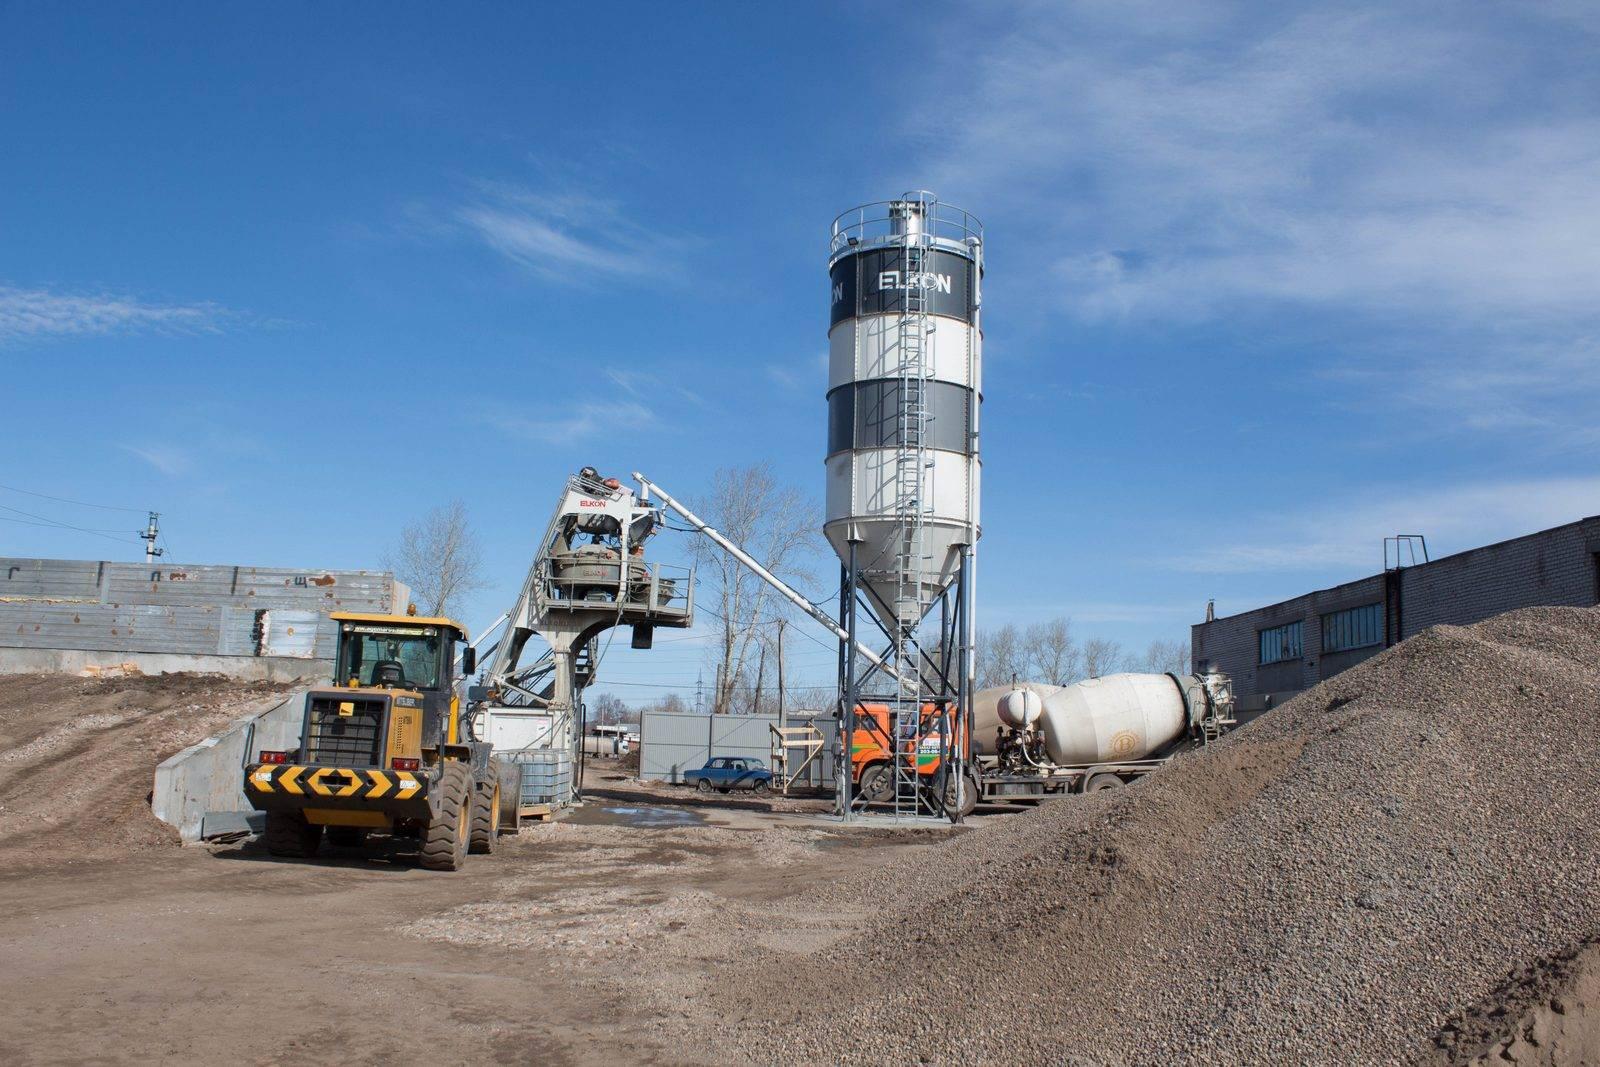 картинки бетона завода причина ребрендинга это